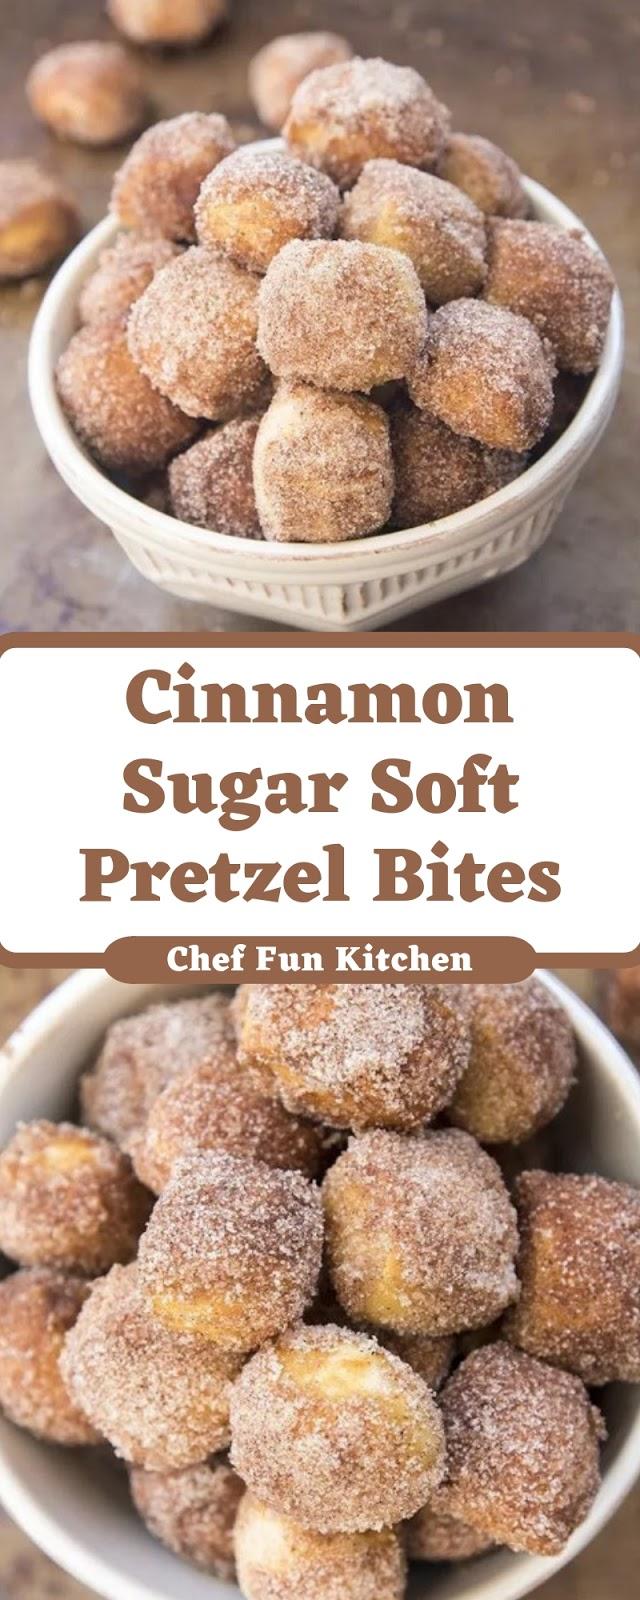 Cinnamon Sugar Soft Pretzel Bites